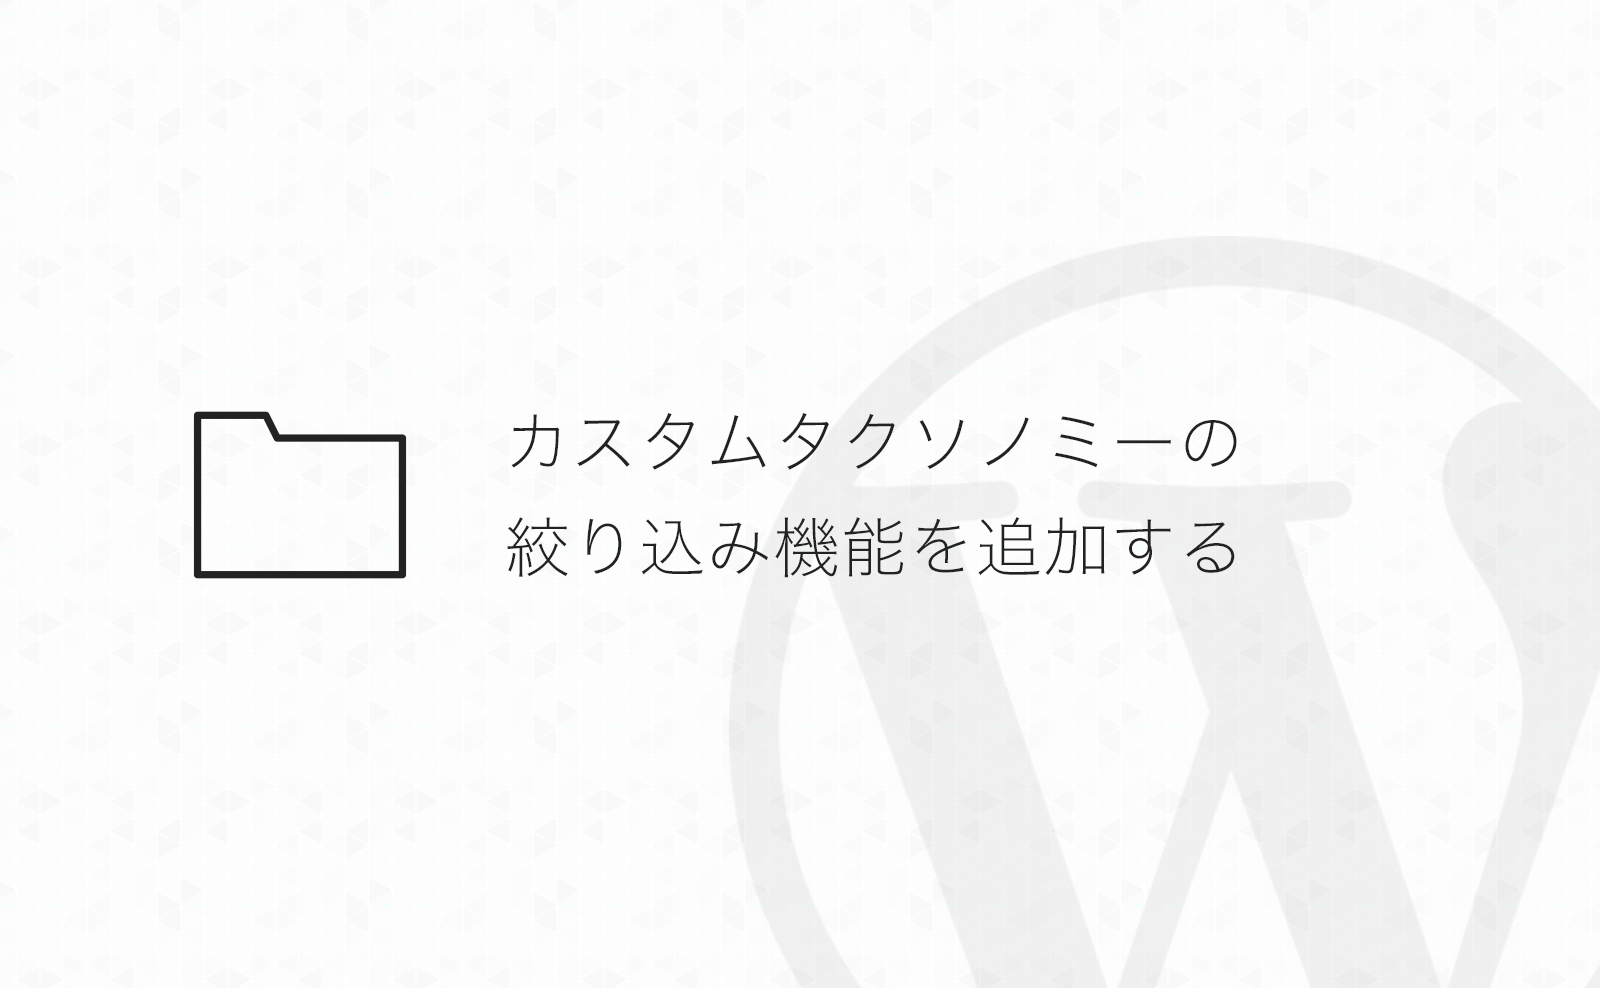 【WordPress】管理画面のカスタム投稿タイプ一覧画面にカスタムタクソノミーの絞り込みを追加する方法